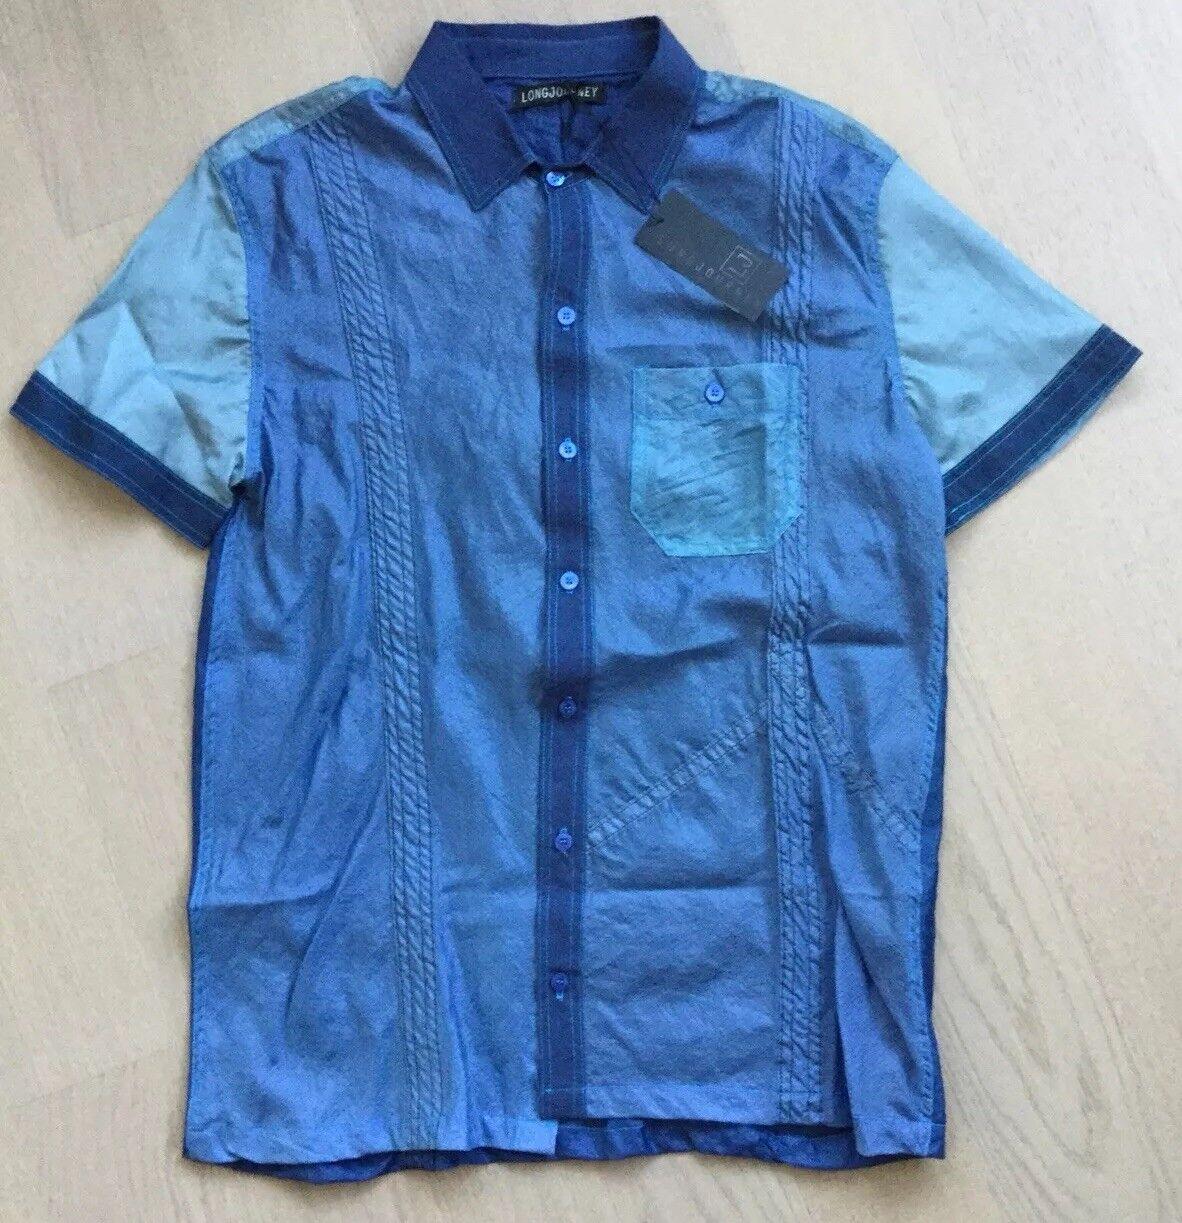 NWT LONGJOURNEY Short Sleeve Shirt made from Vintage Parachutes Sz M